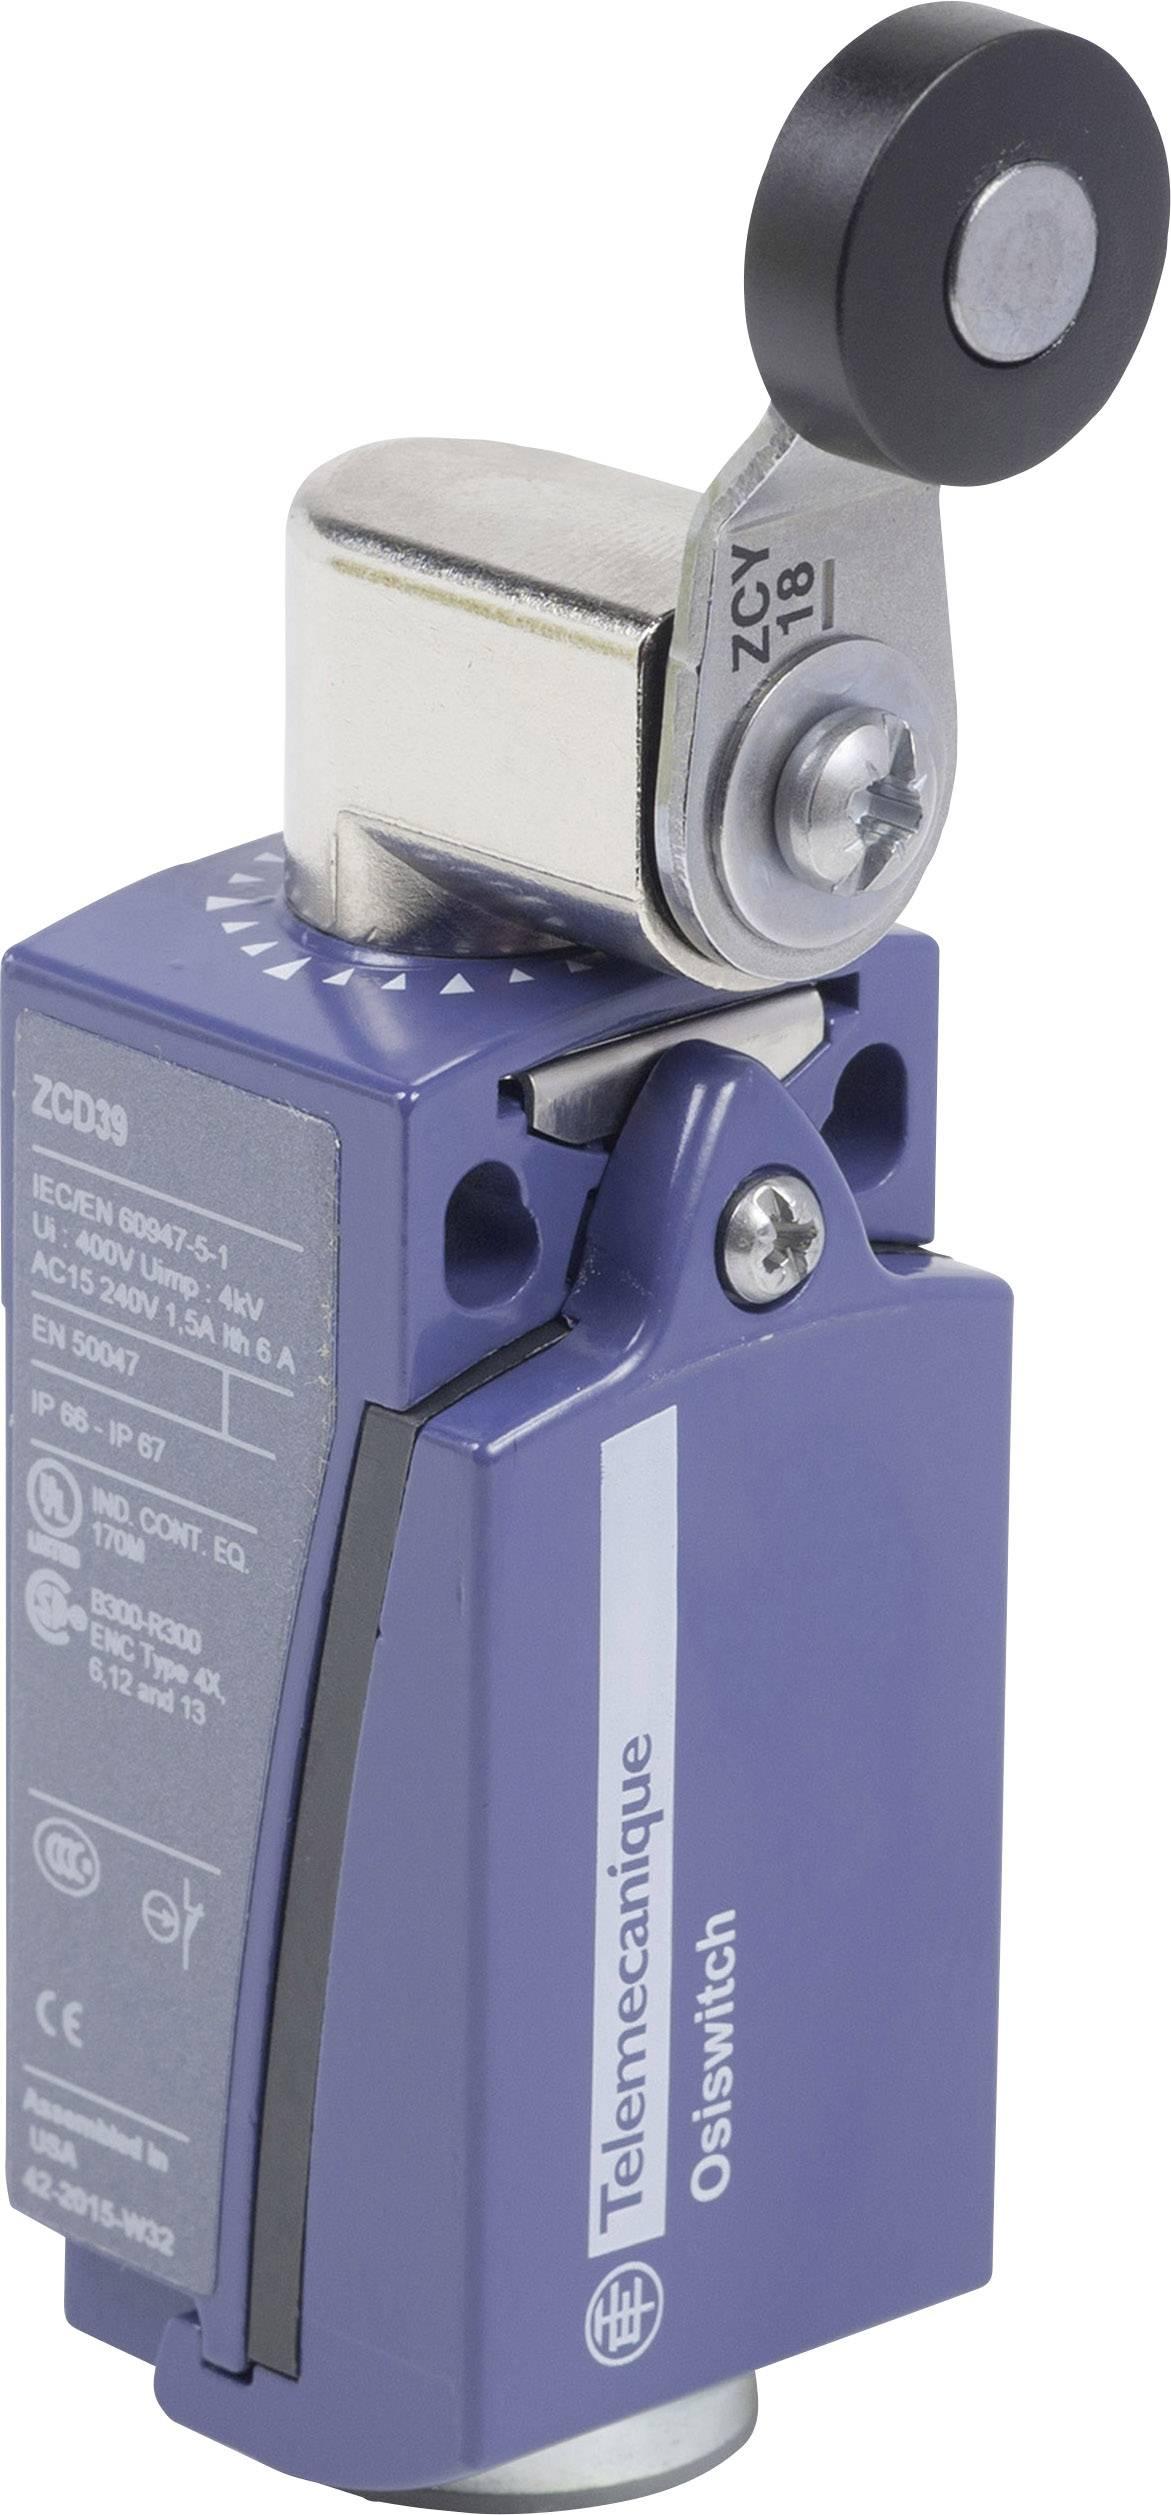 Koncový spínač Schneider Electric XCKD2118P16, páka s rolnou, bez aretace, IP67, 1 ks